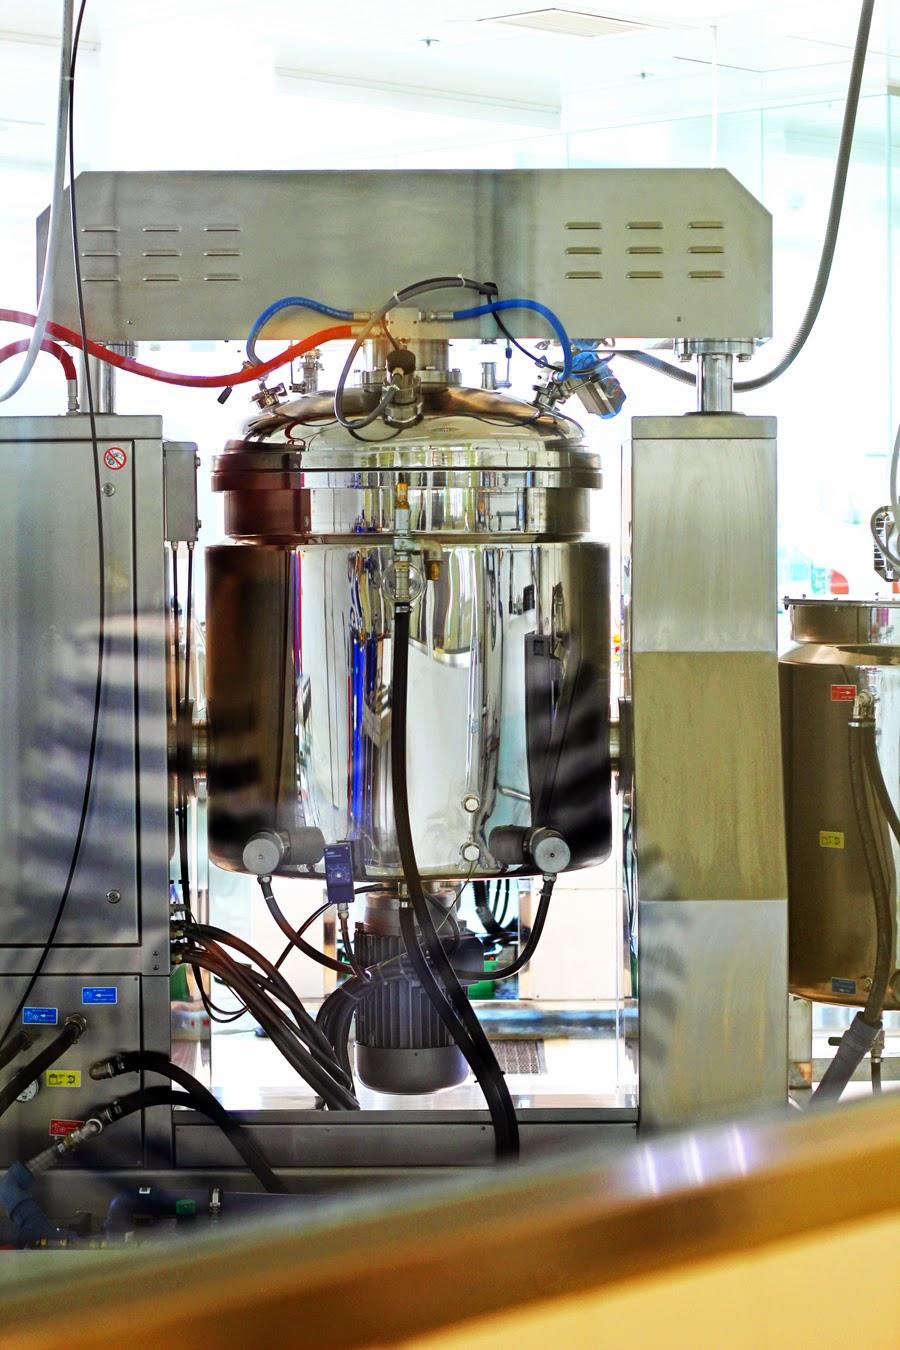 produktion behälter labor kosemtik ringana